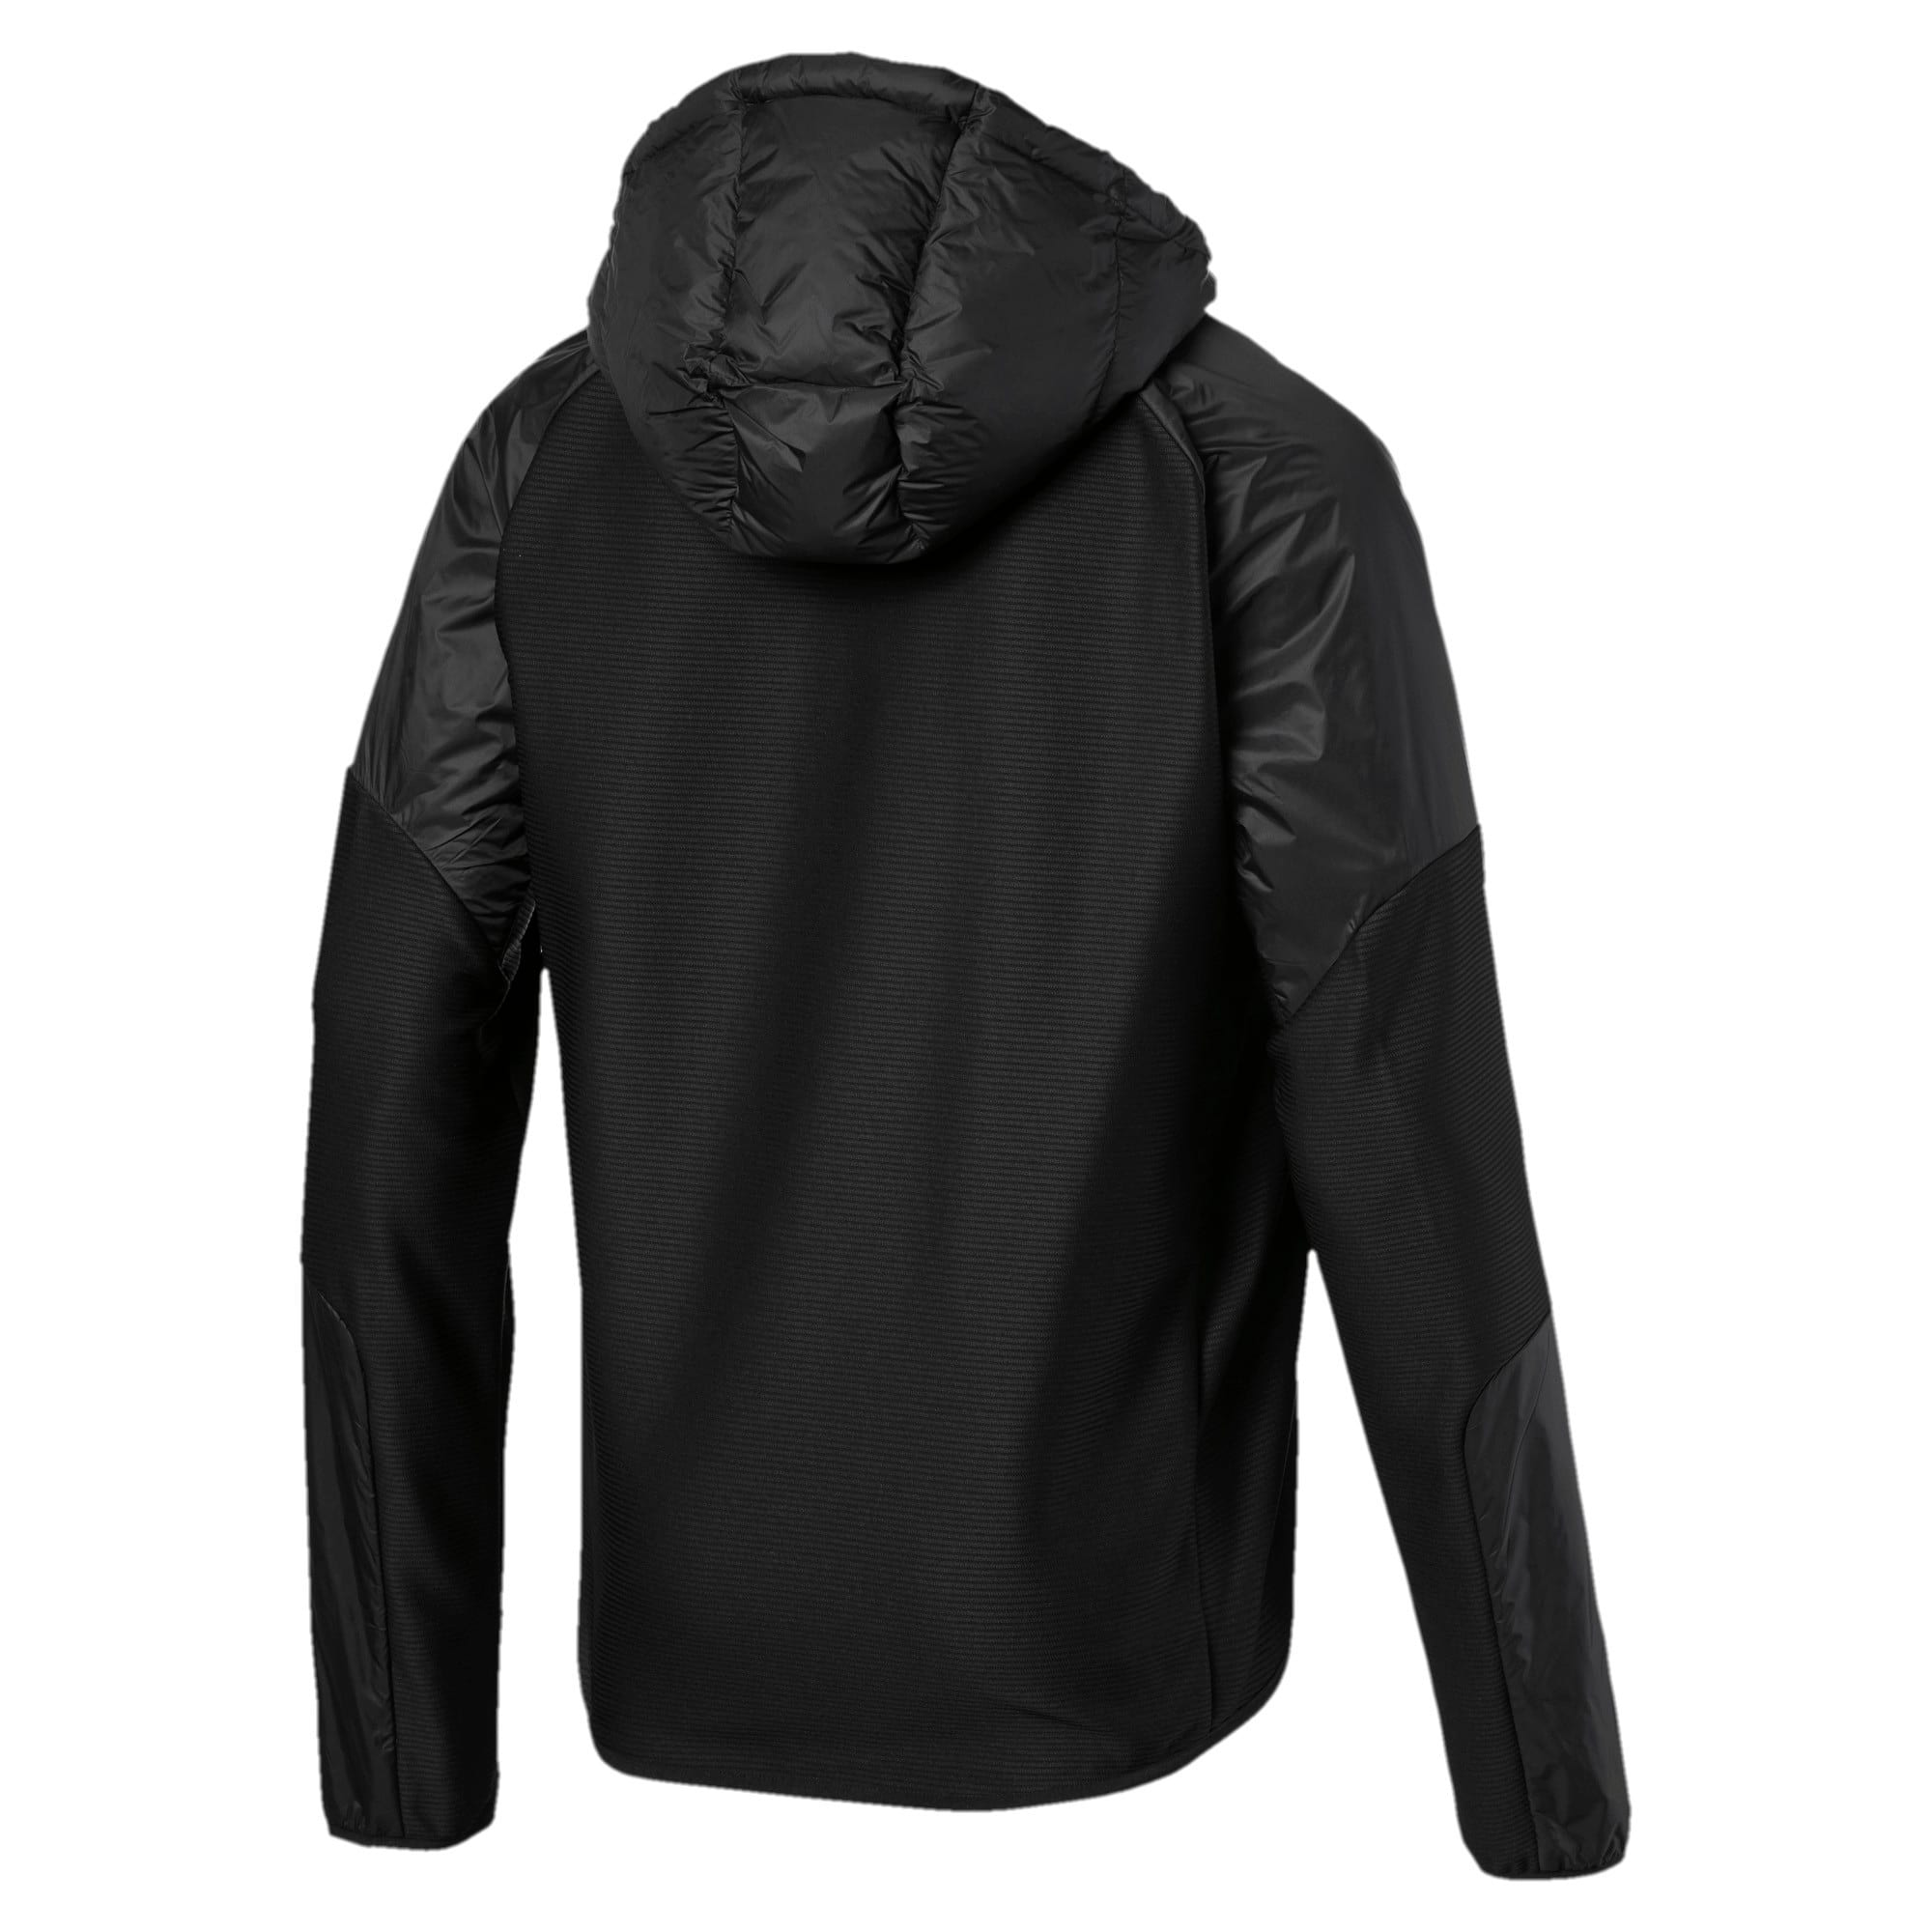 Thumbnail 5 of 600 Hybrid Down Men's Jacket, Puma Black, medium-IND